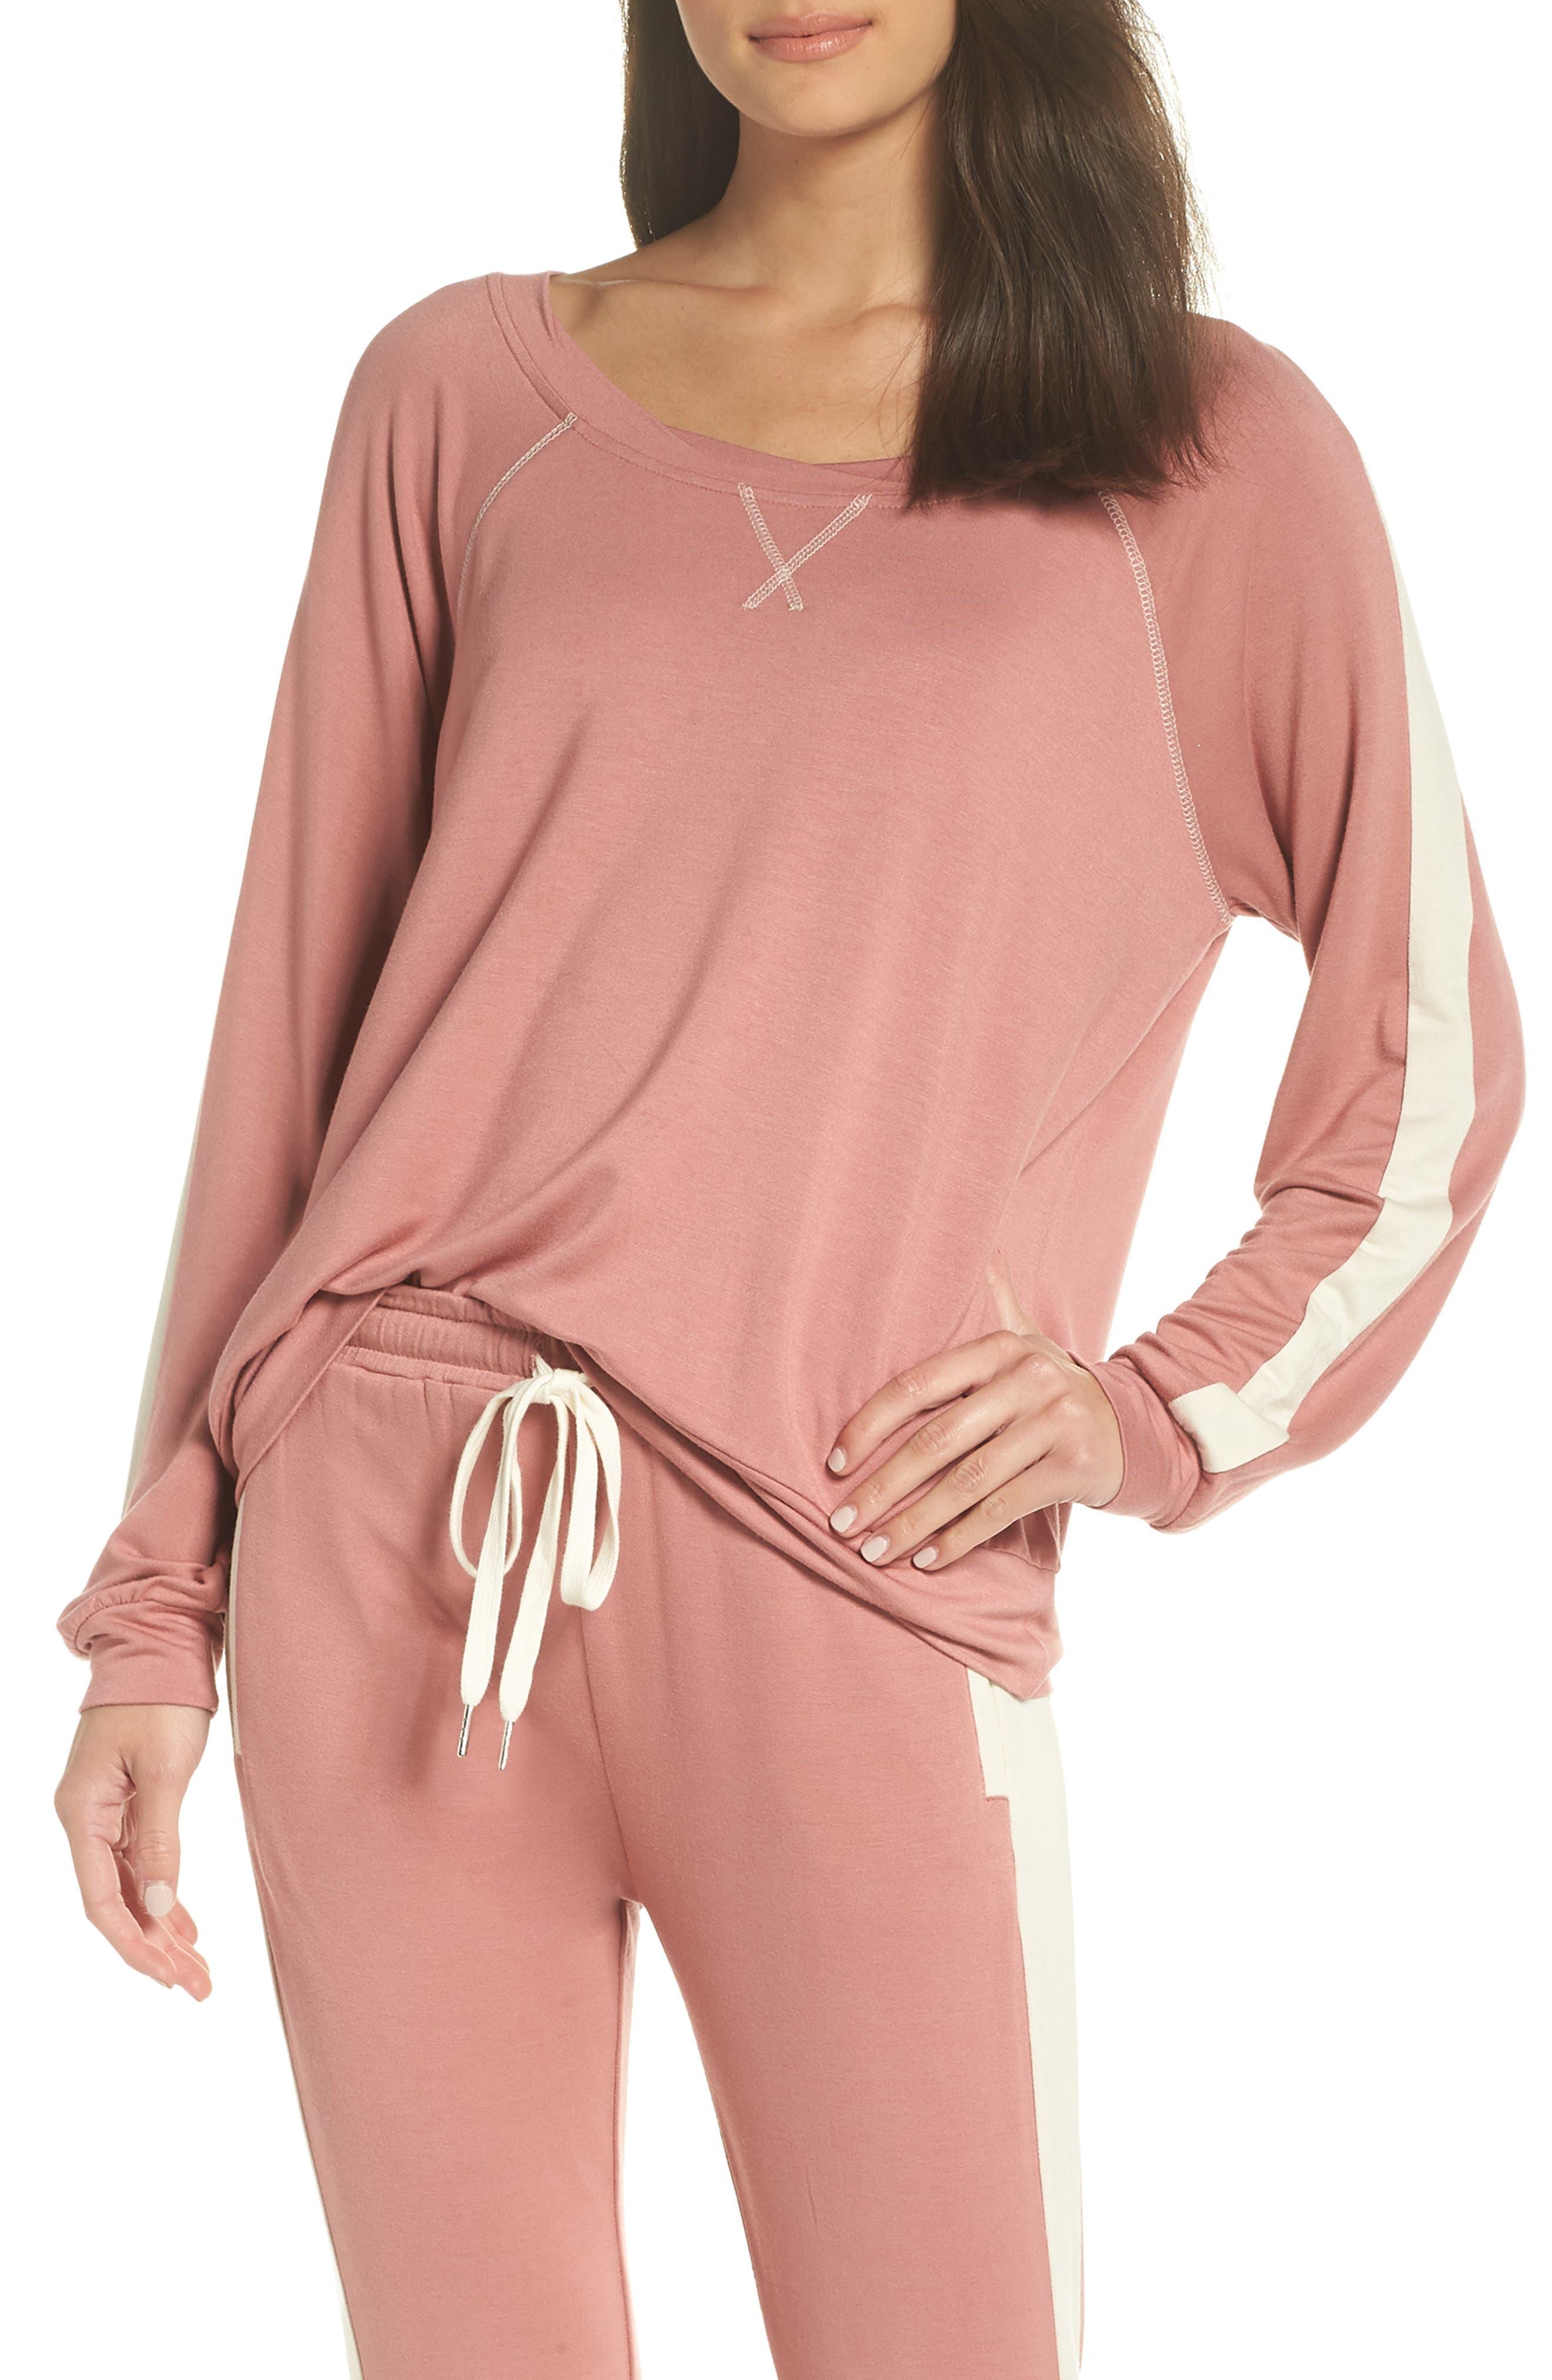 Elevens Sweatshirt,                         Main,                         color, MAUVE/ SAND